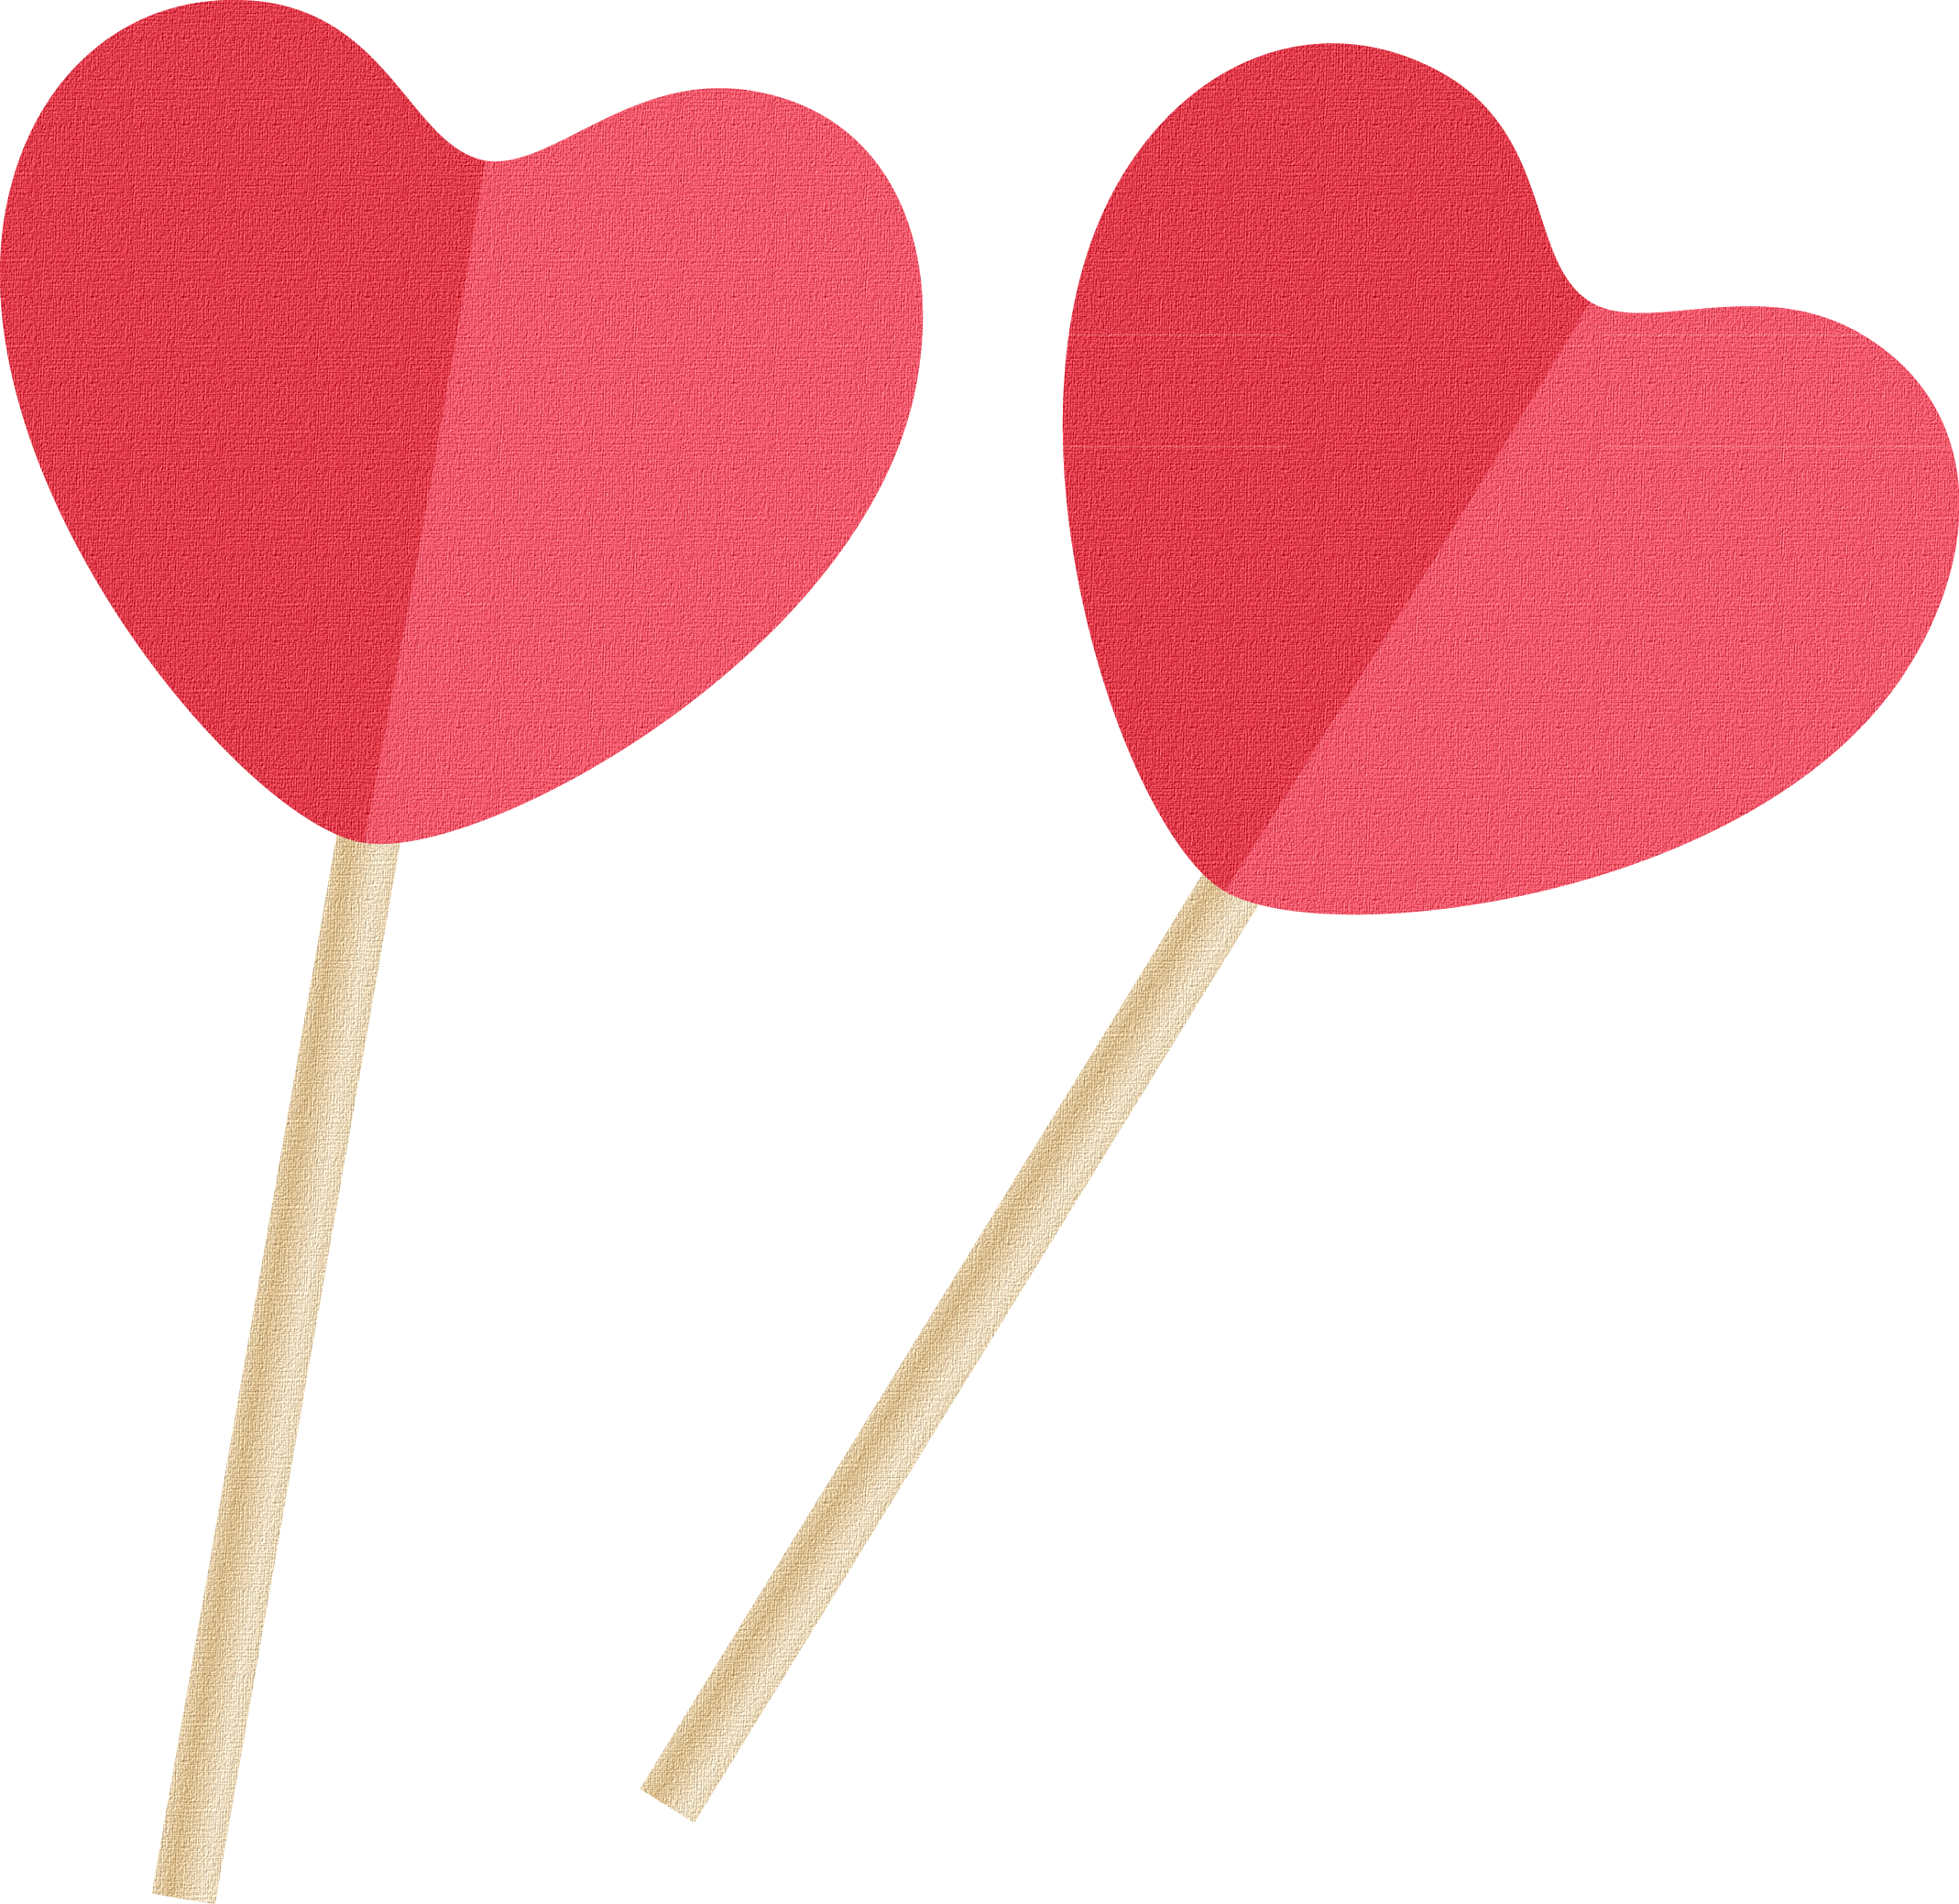 Clipart hearts lollipop. Adobe illustrator heart transprent